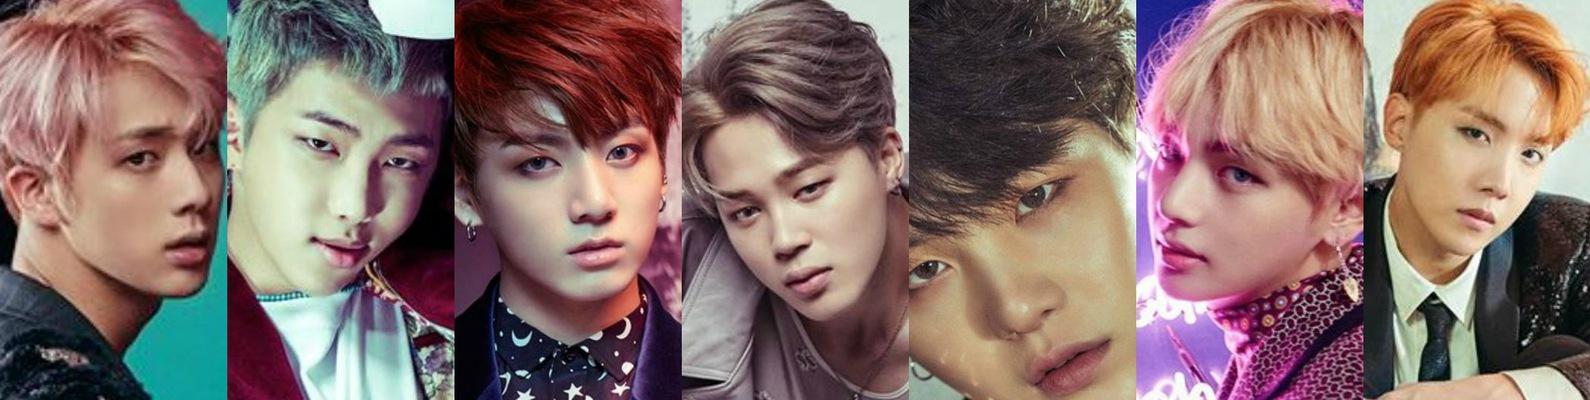 Bts | k-pop вики | fandom